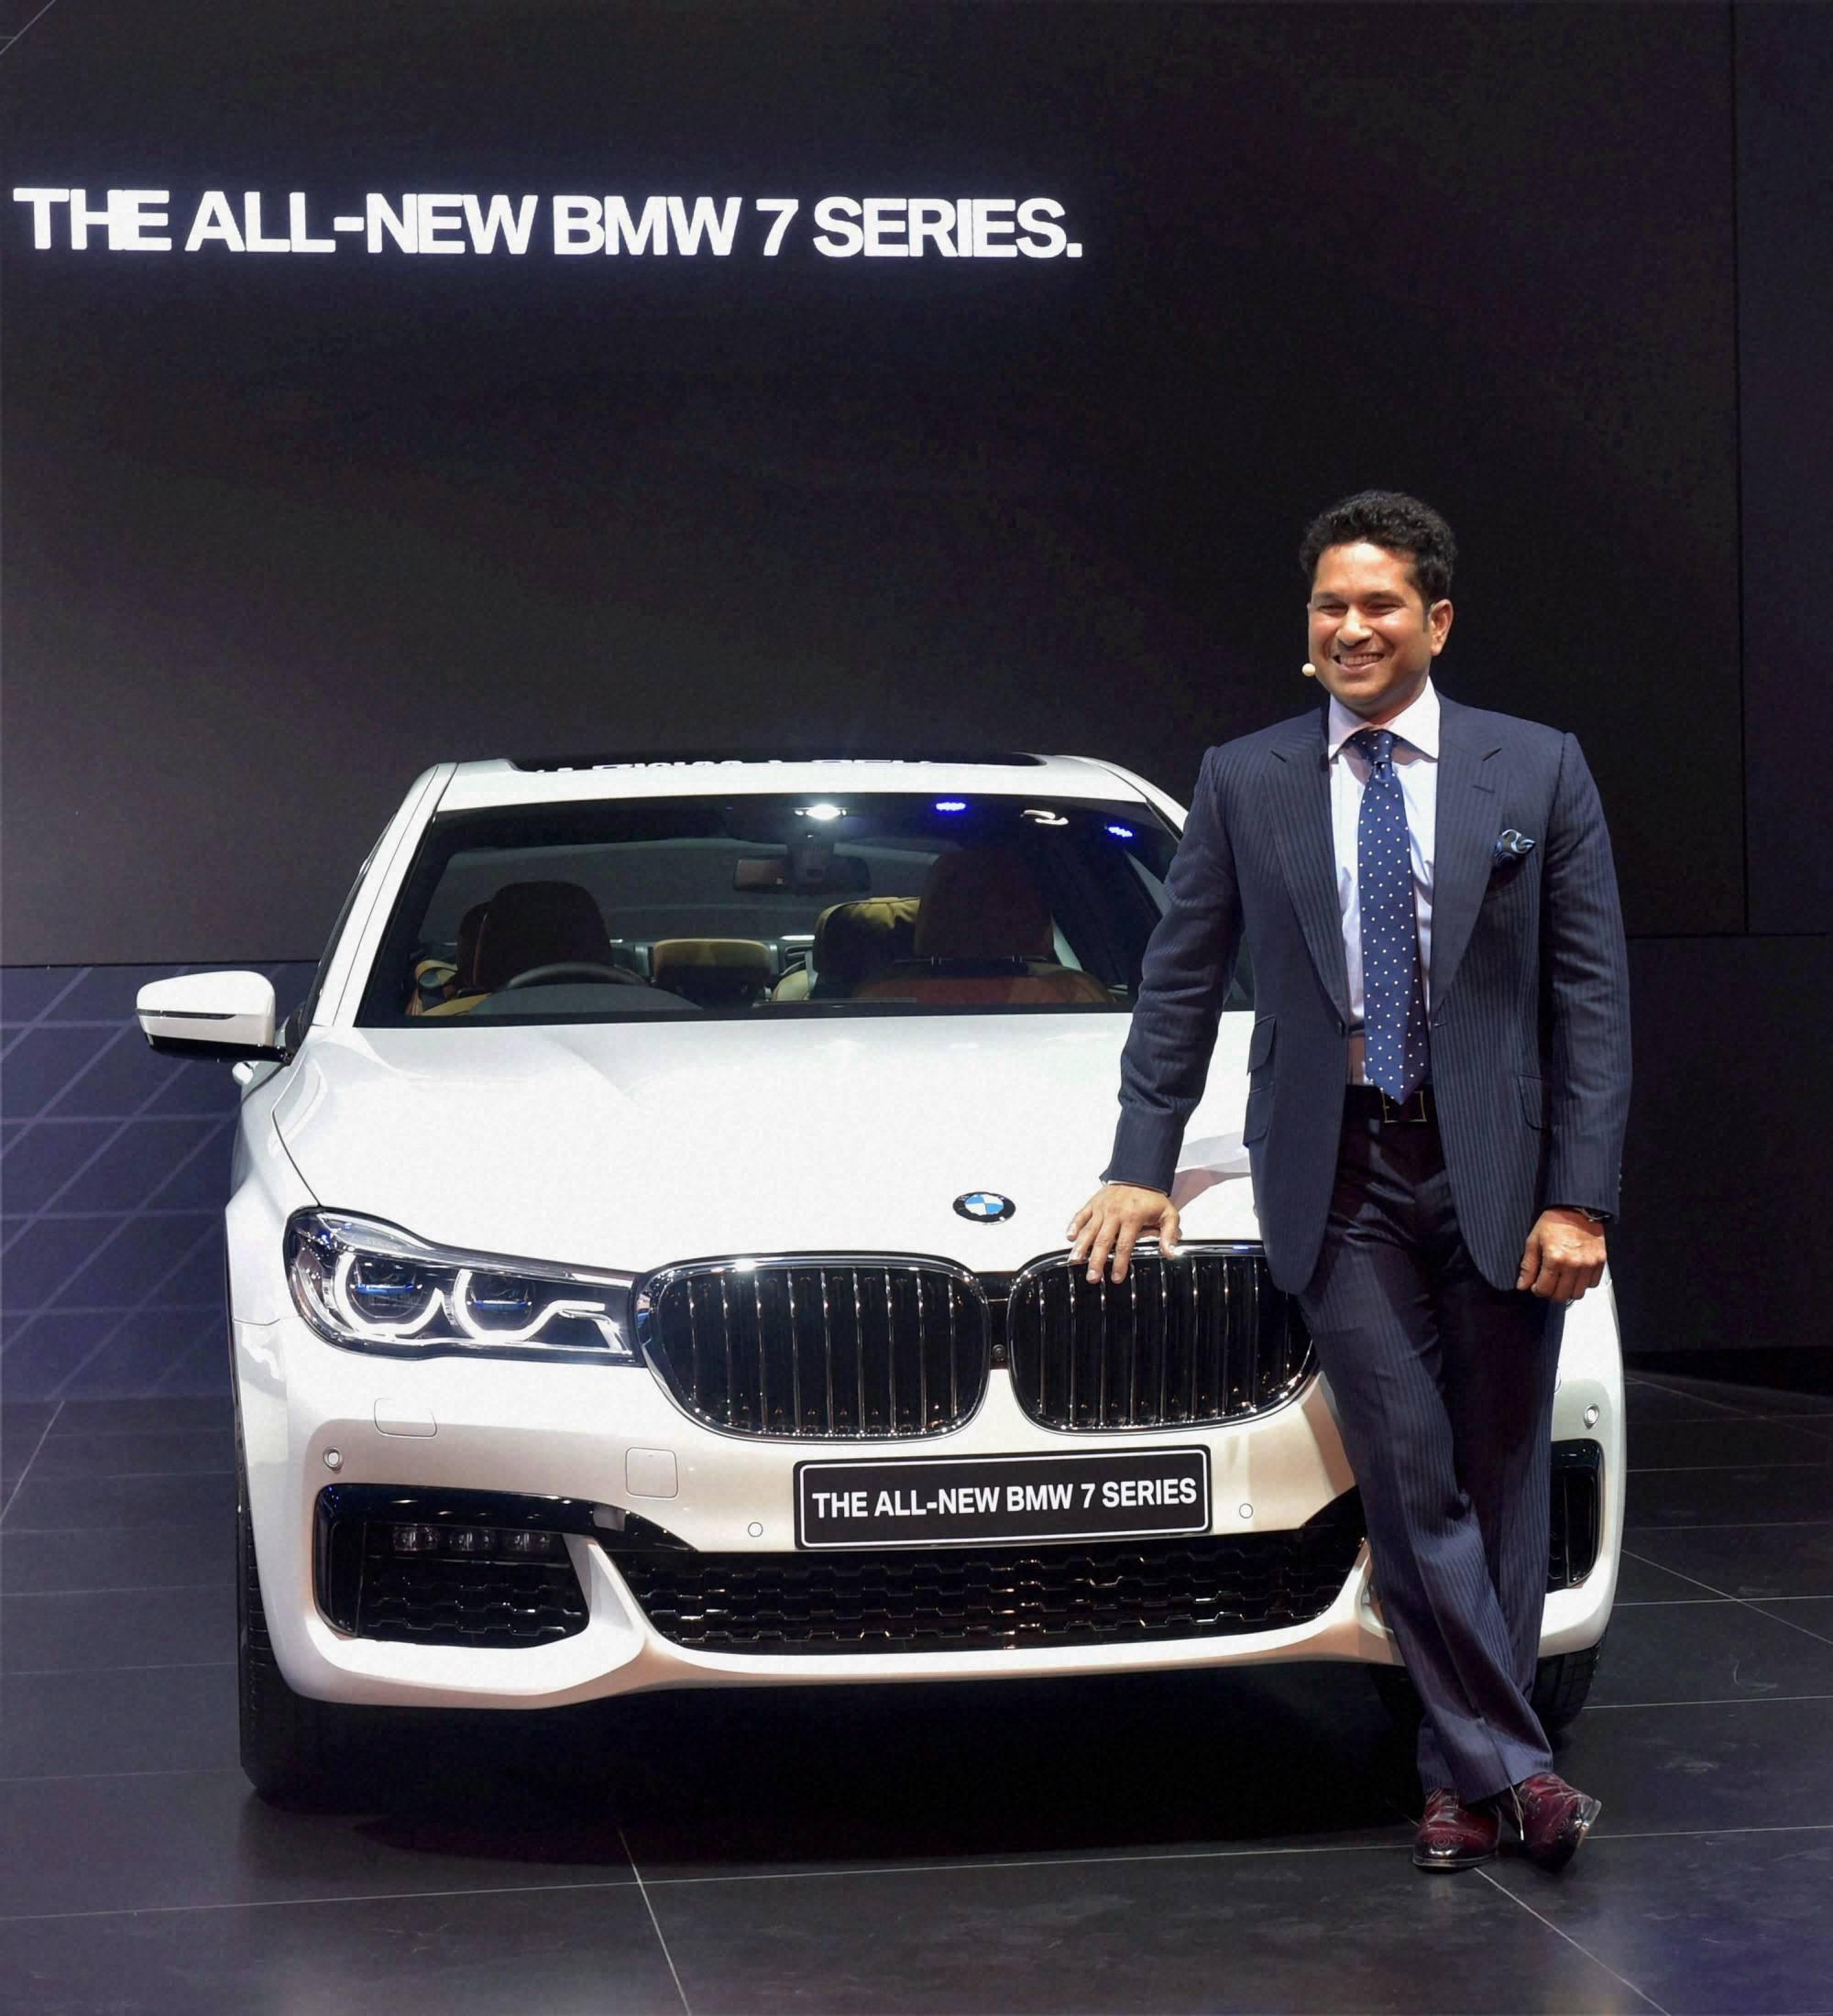 Auto expo 2016 sachin tendulkar at the launch of bmw 7 series